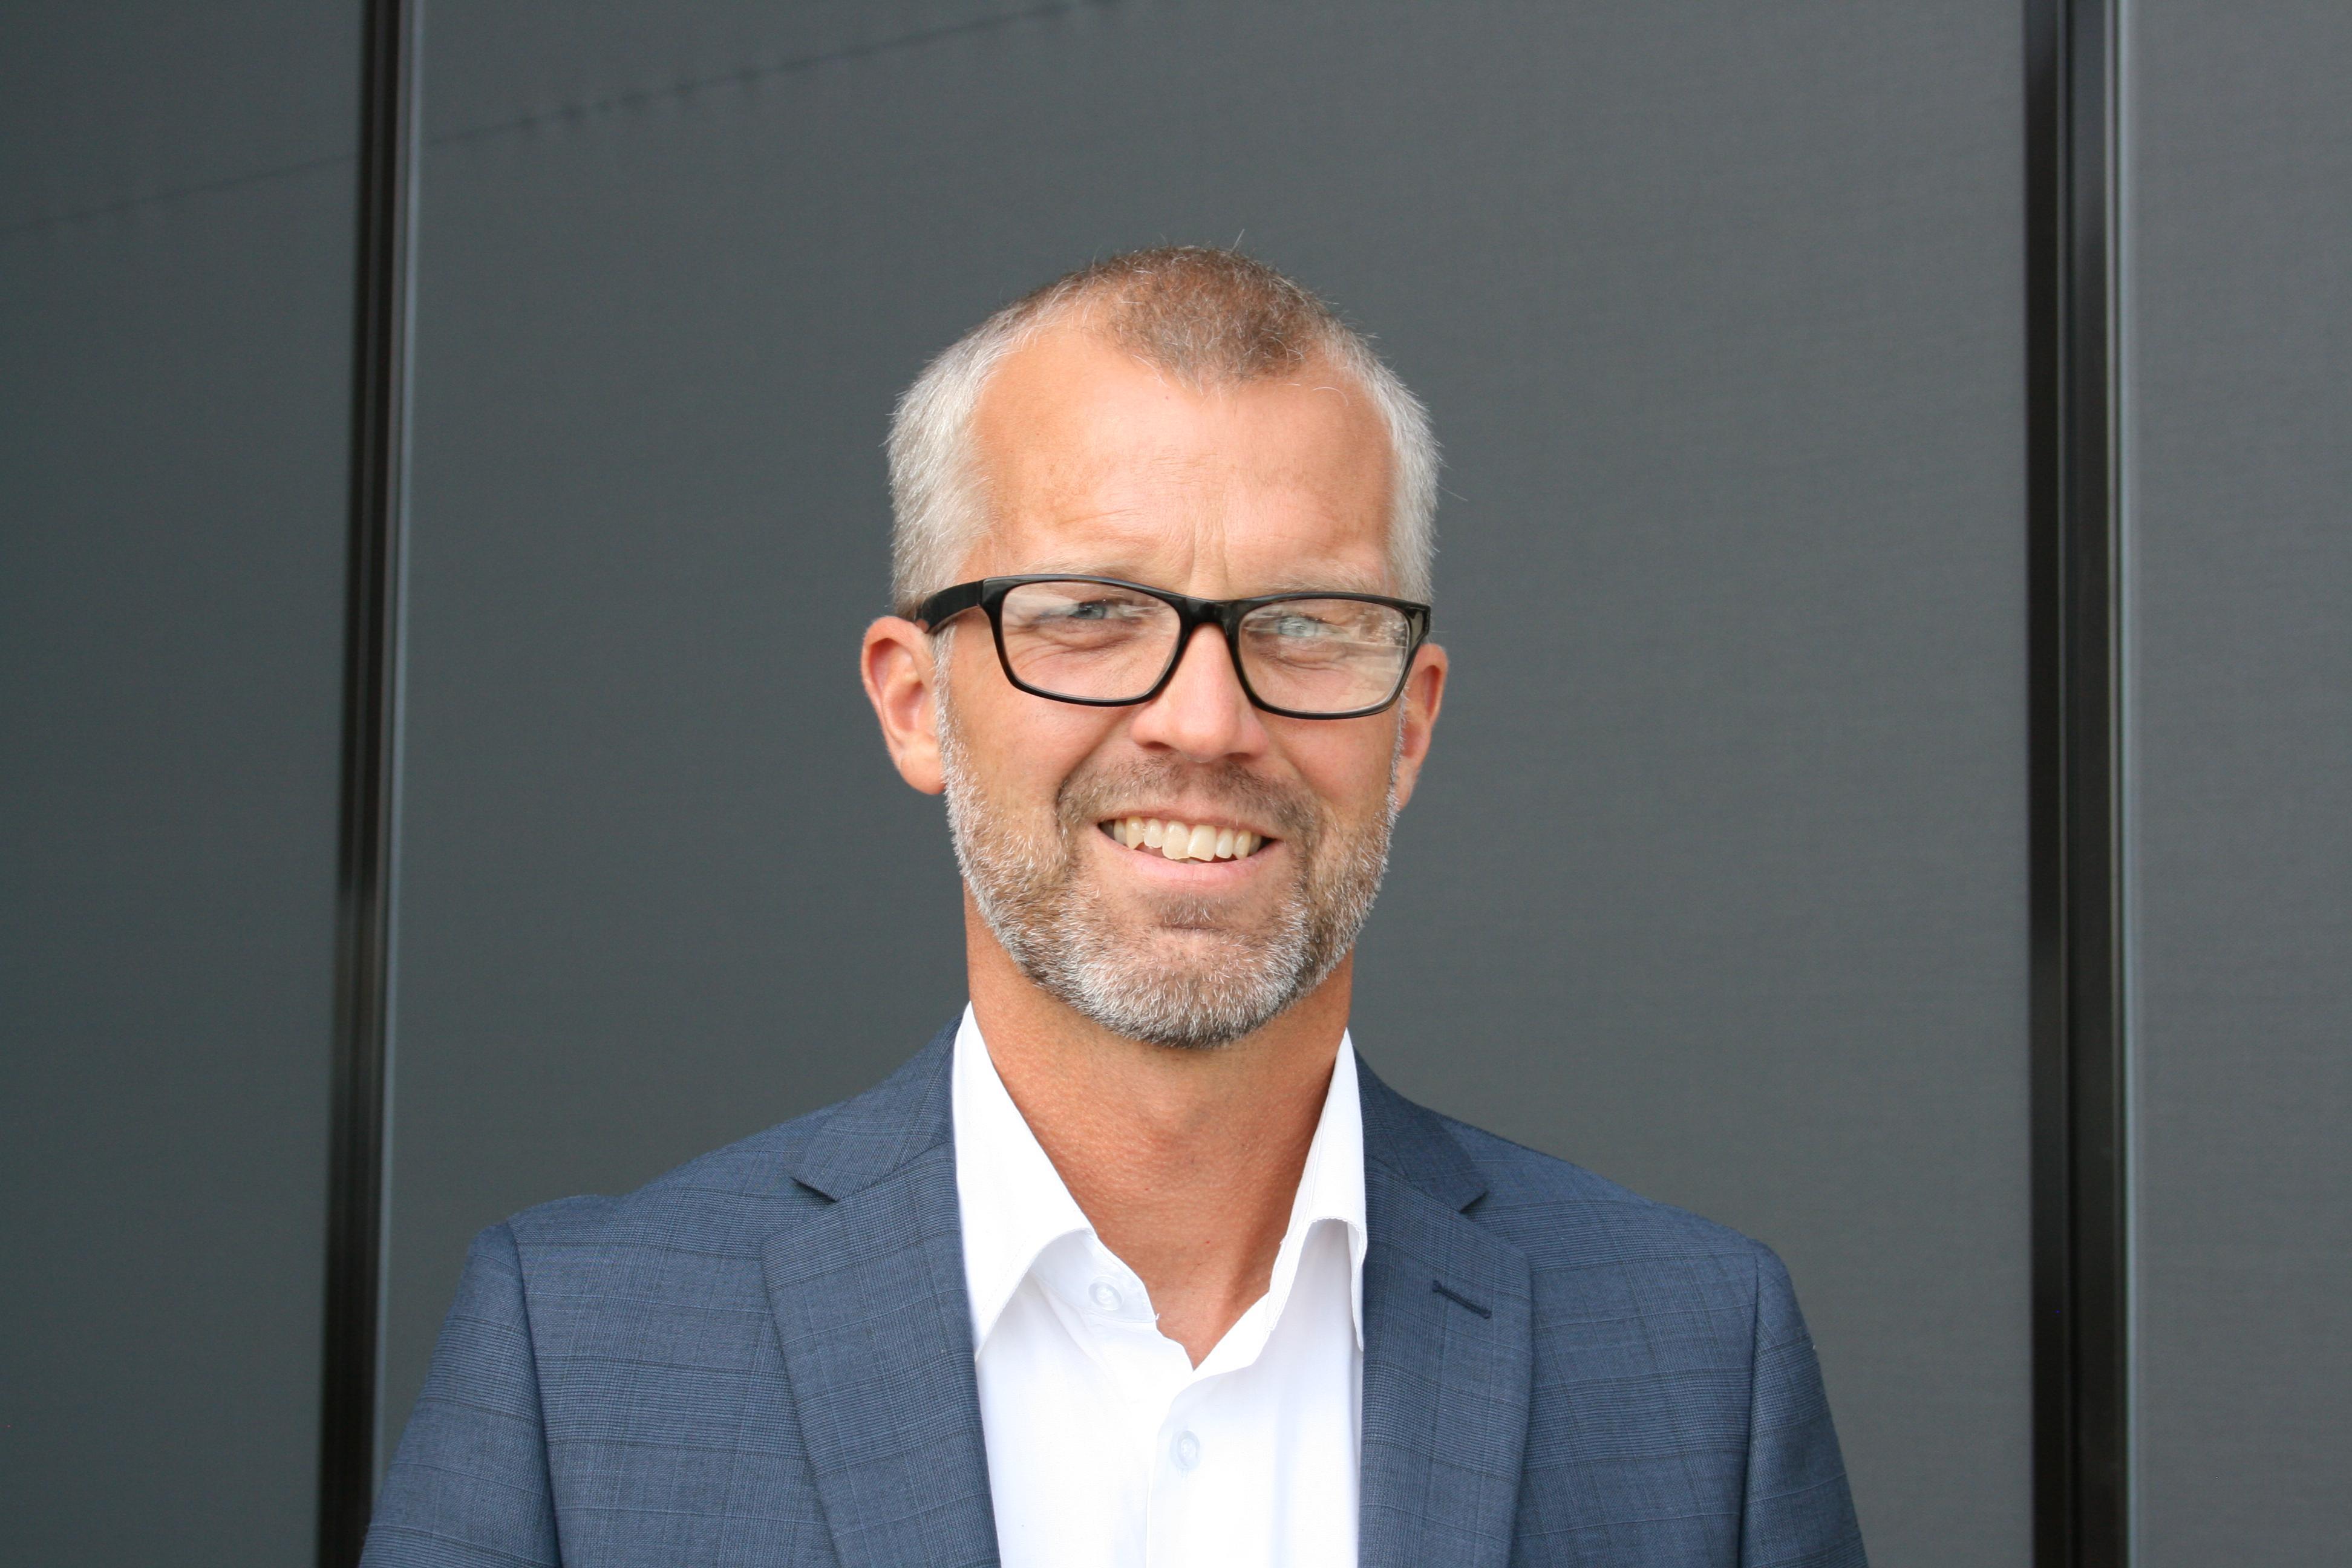 Fredrik Lennström er e-handelsrådgiver i Klarna.Foto: Ida Oftebro/Mobilen.no